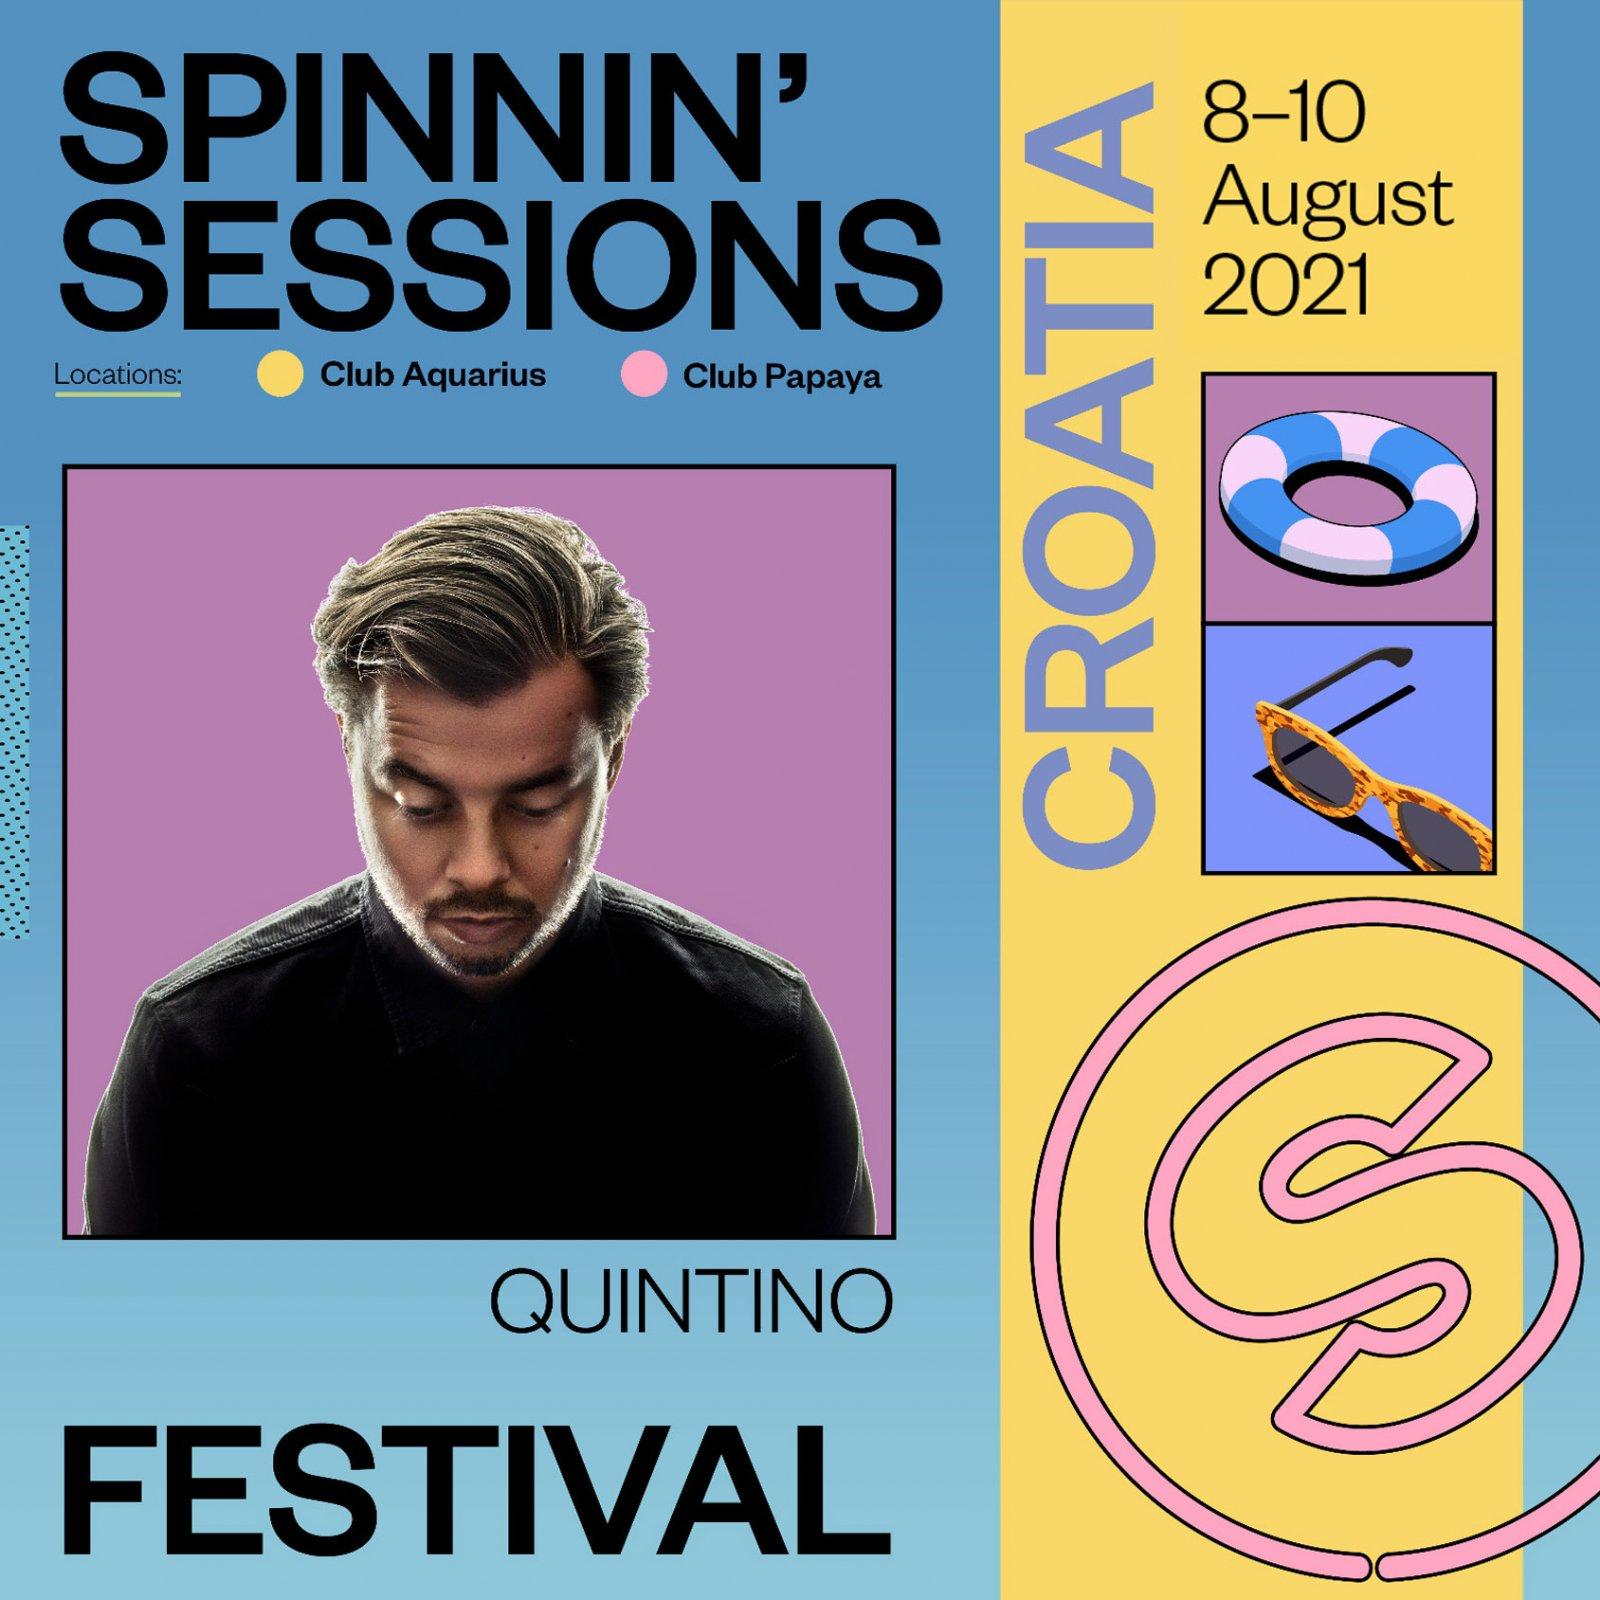 Spinnin' Sessions Festival Croatia 2021 Quintino